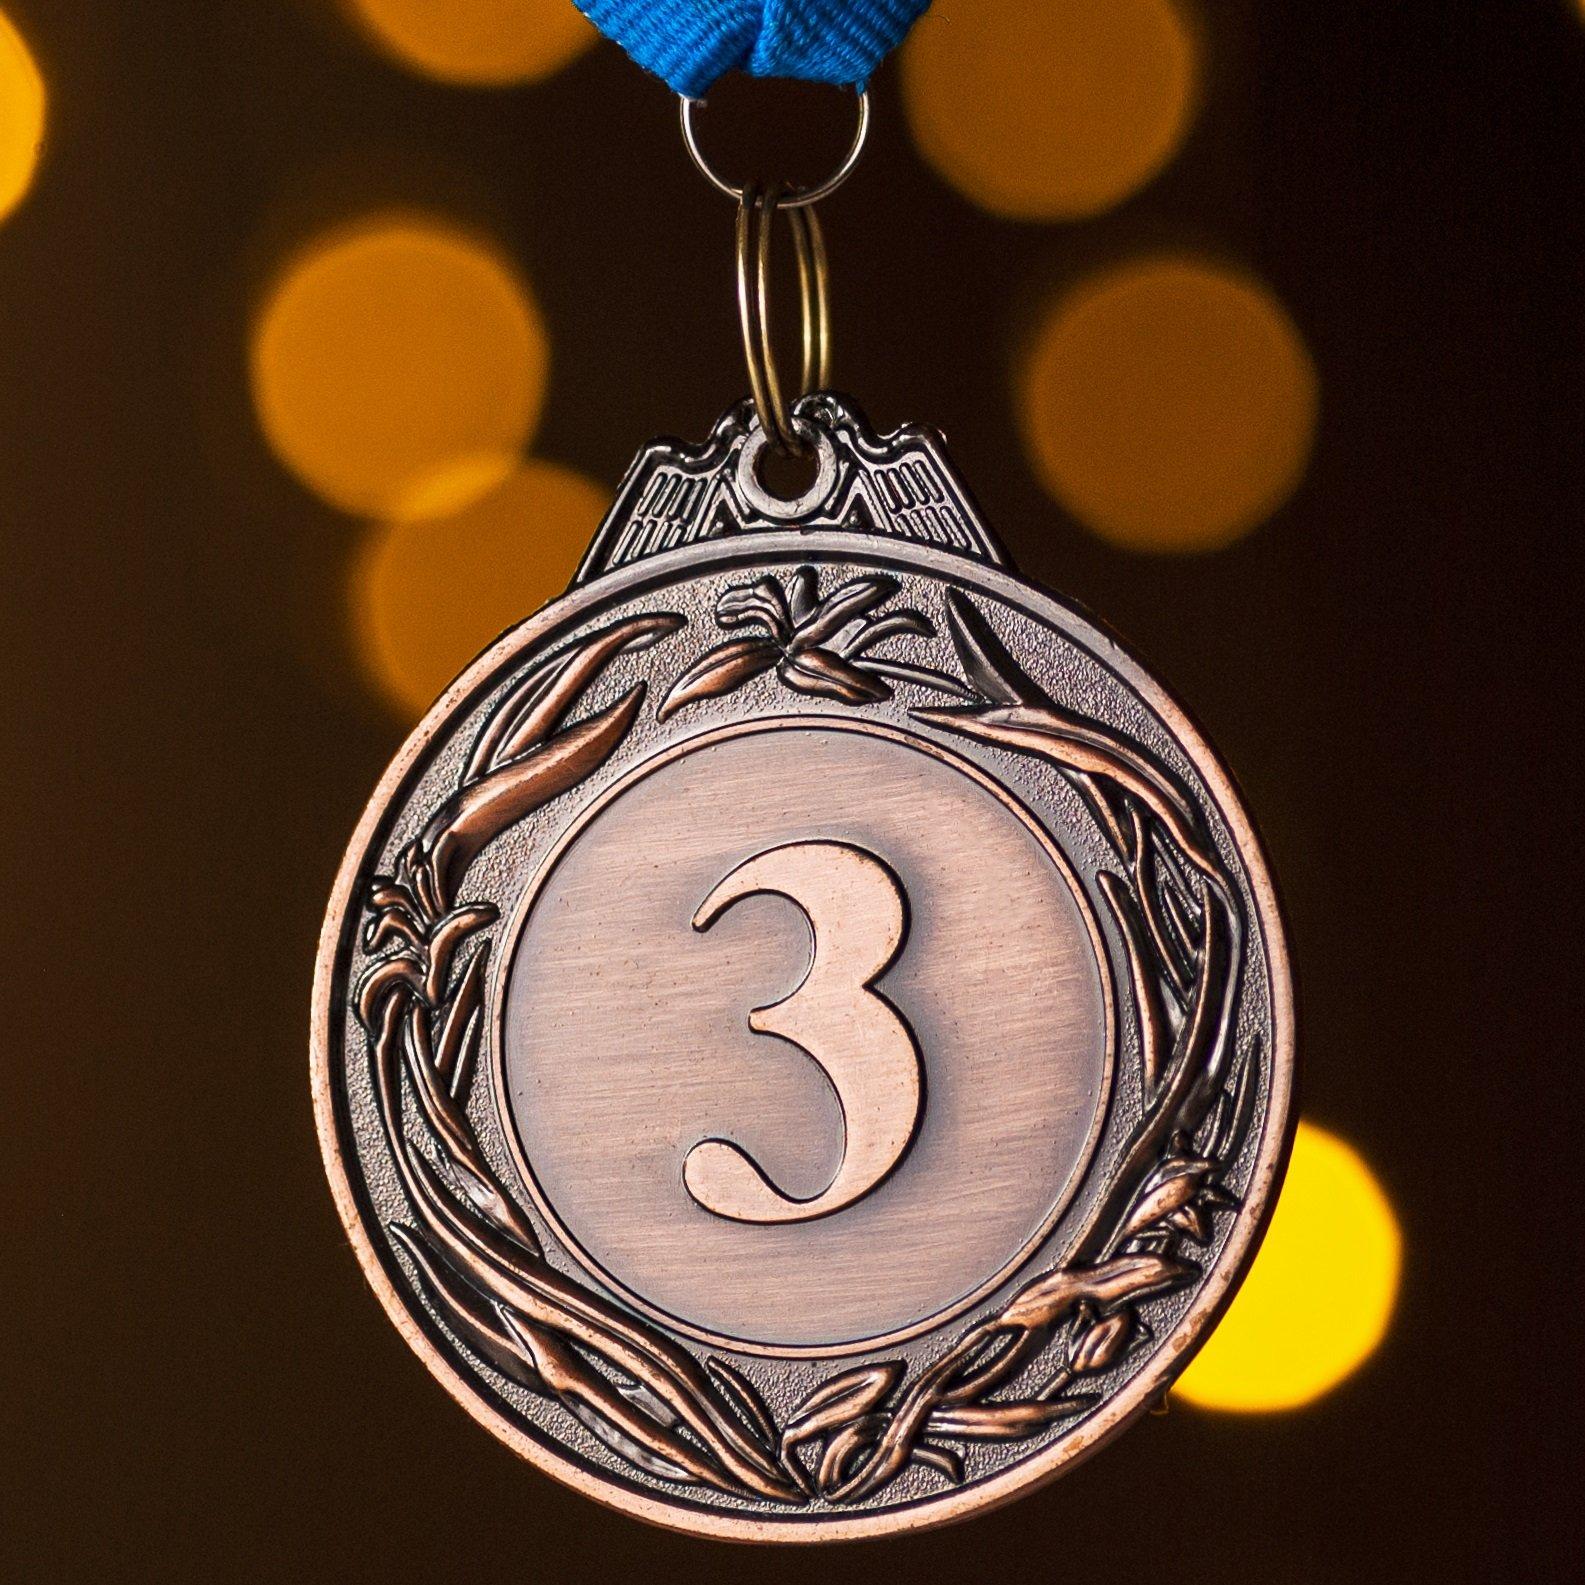 3rdPlace icon